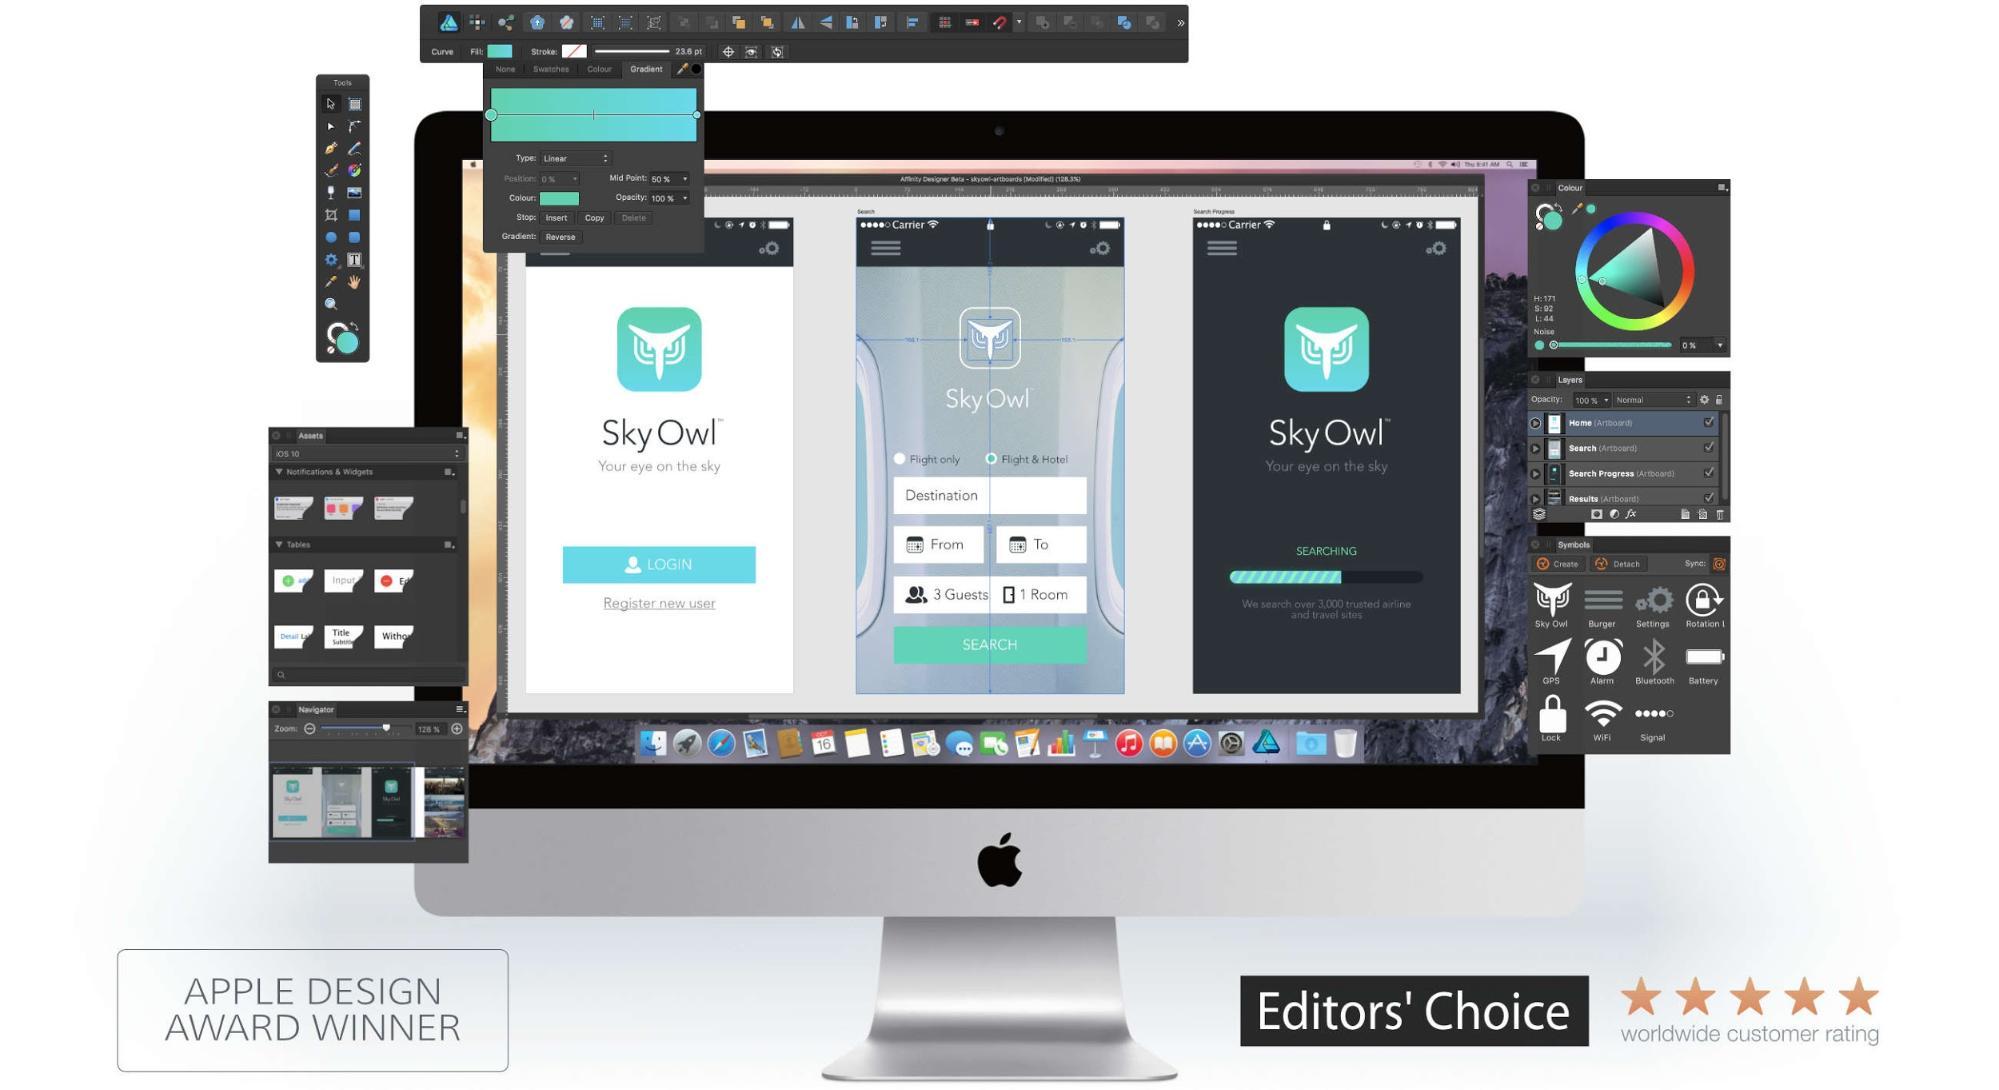 Affinity Designers get a UI-focused update